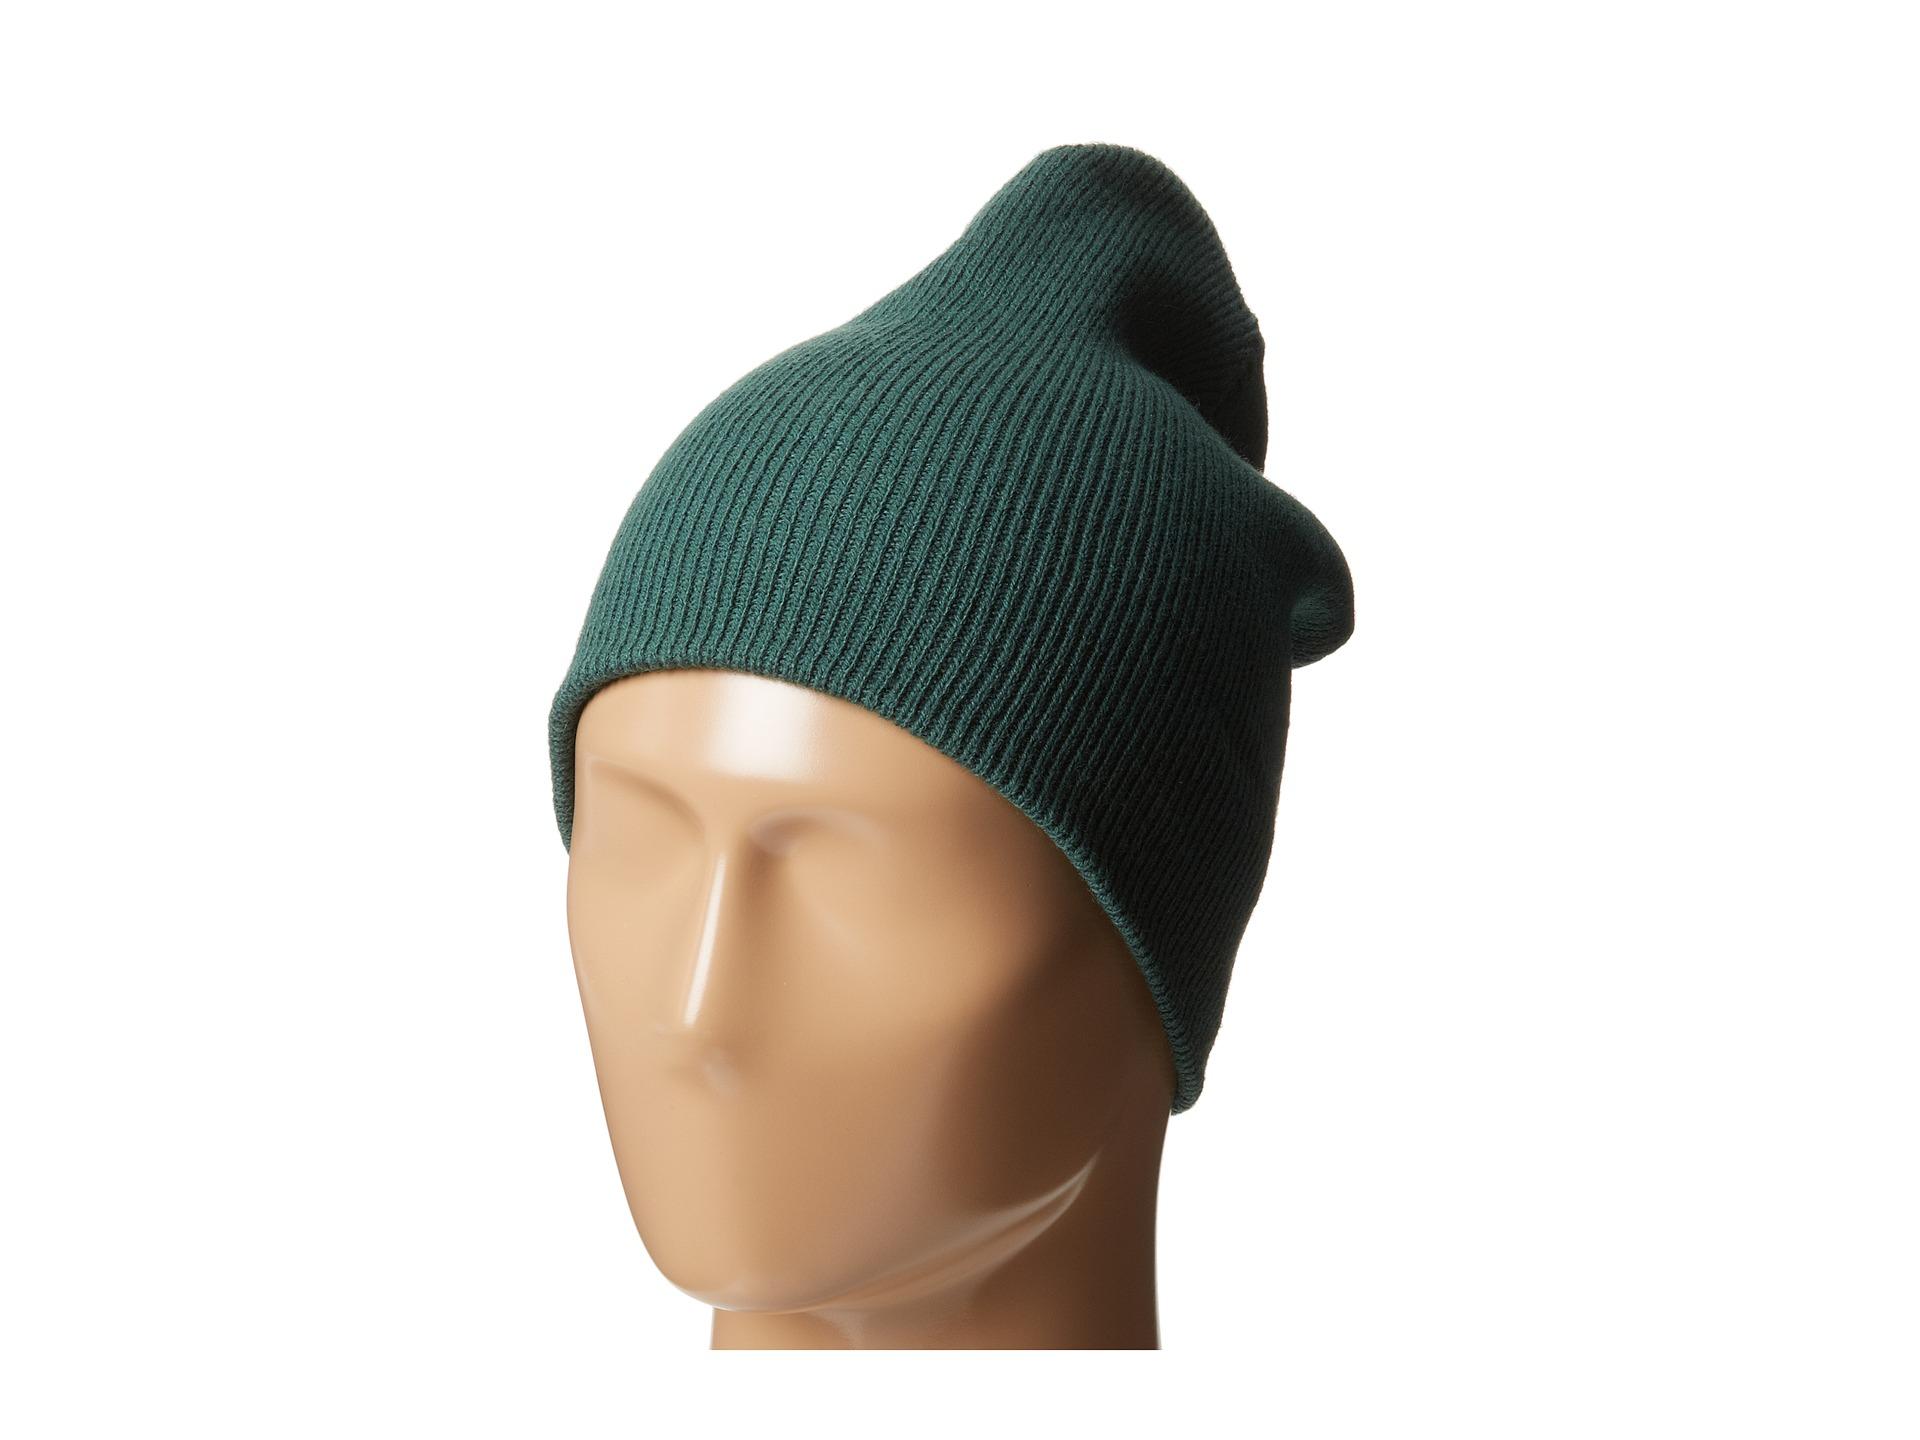 7dcb2f28d3d Lyst - Vans Milford Beanie in Green for Men